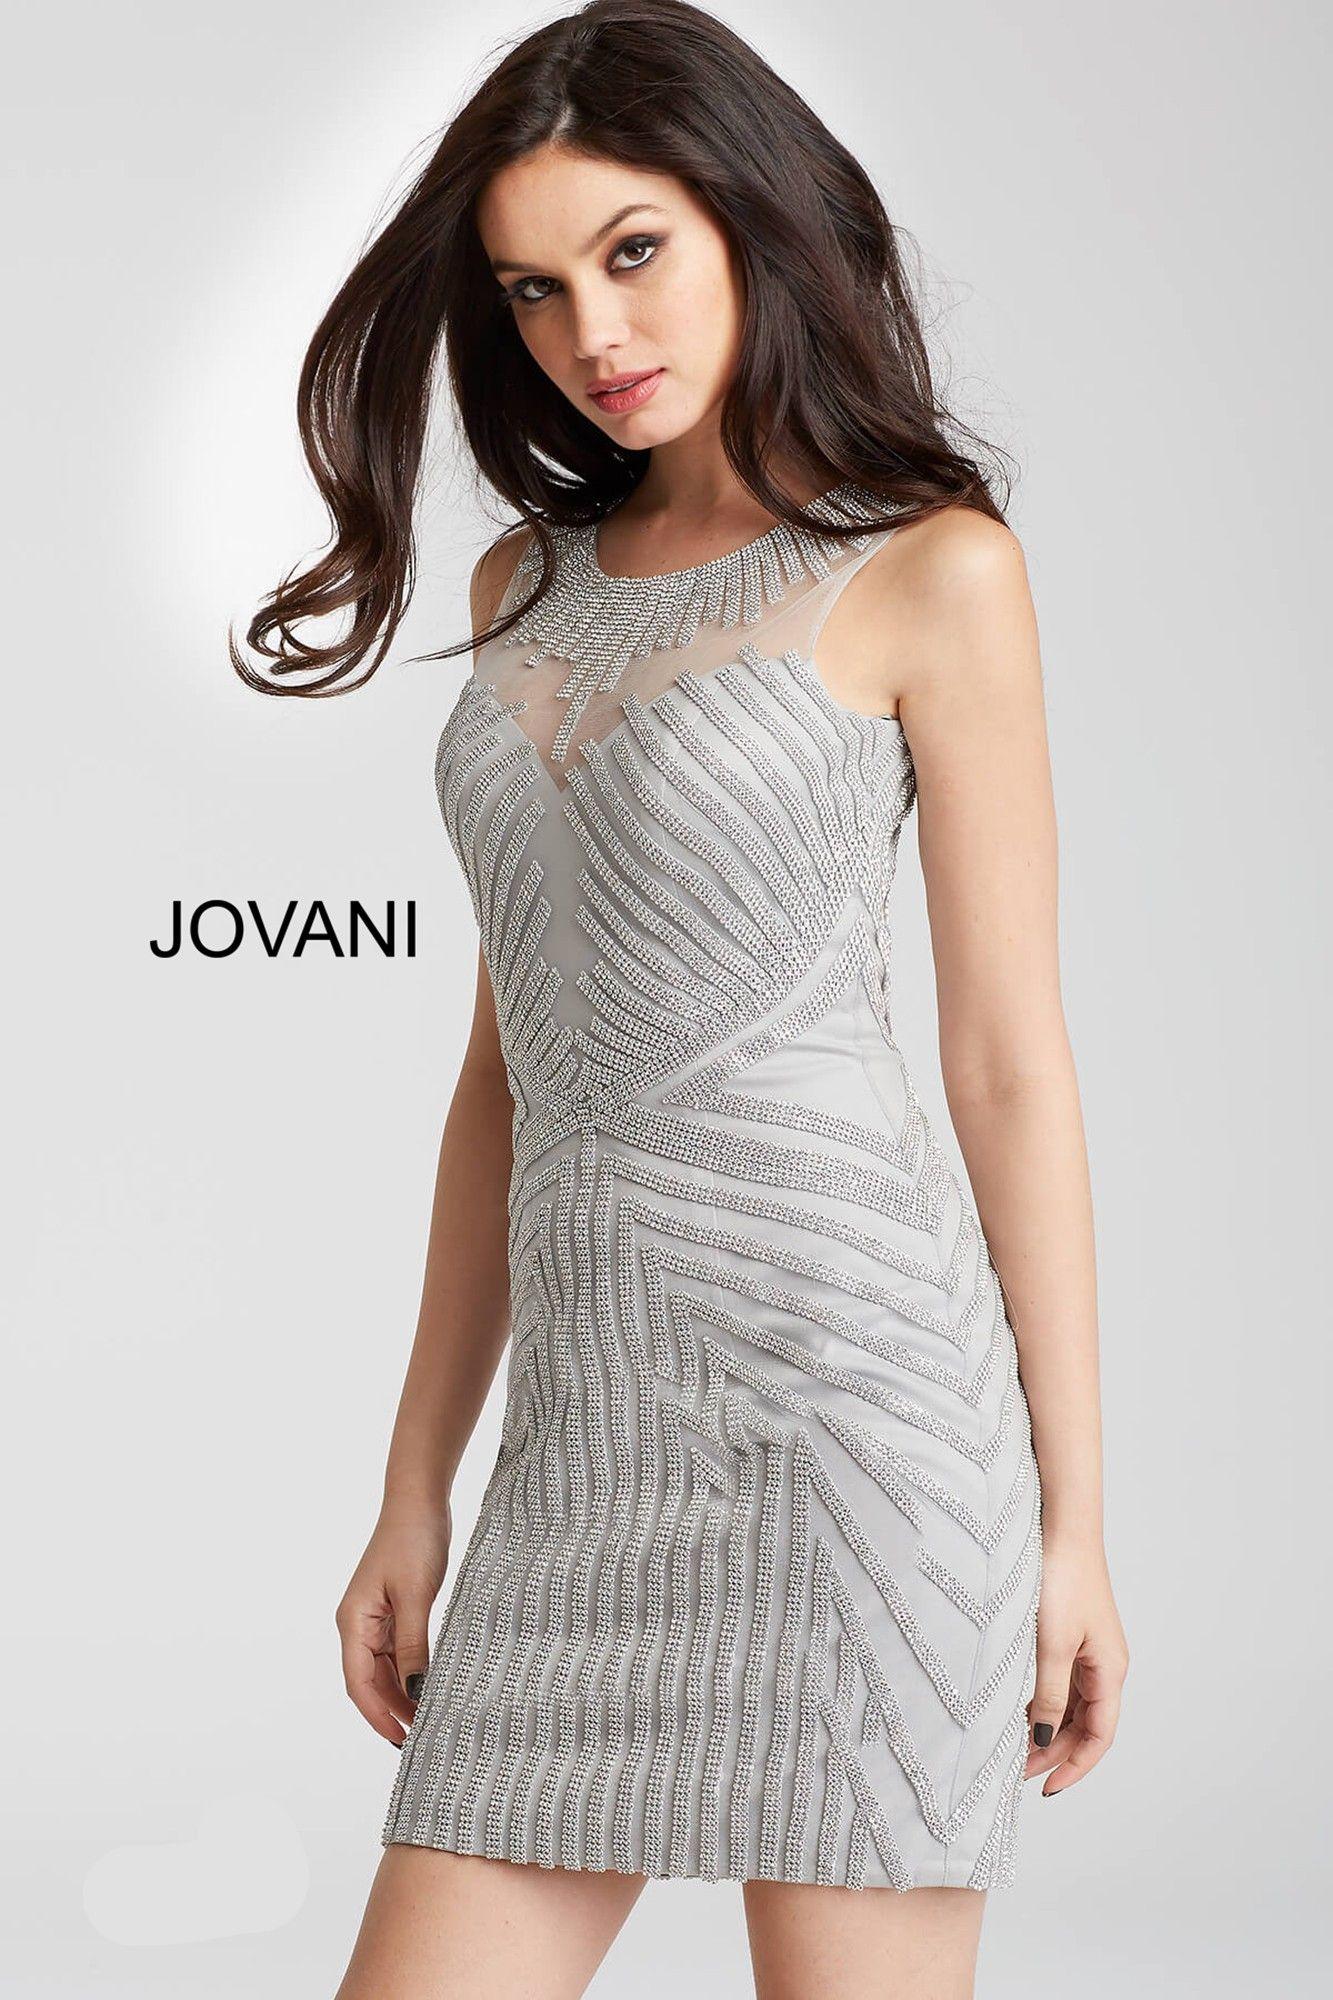 Jovani 55857 Jeweled Geometric Short Dress | Pinterest